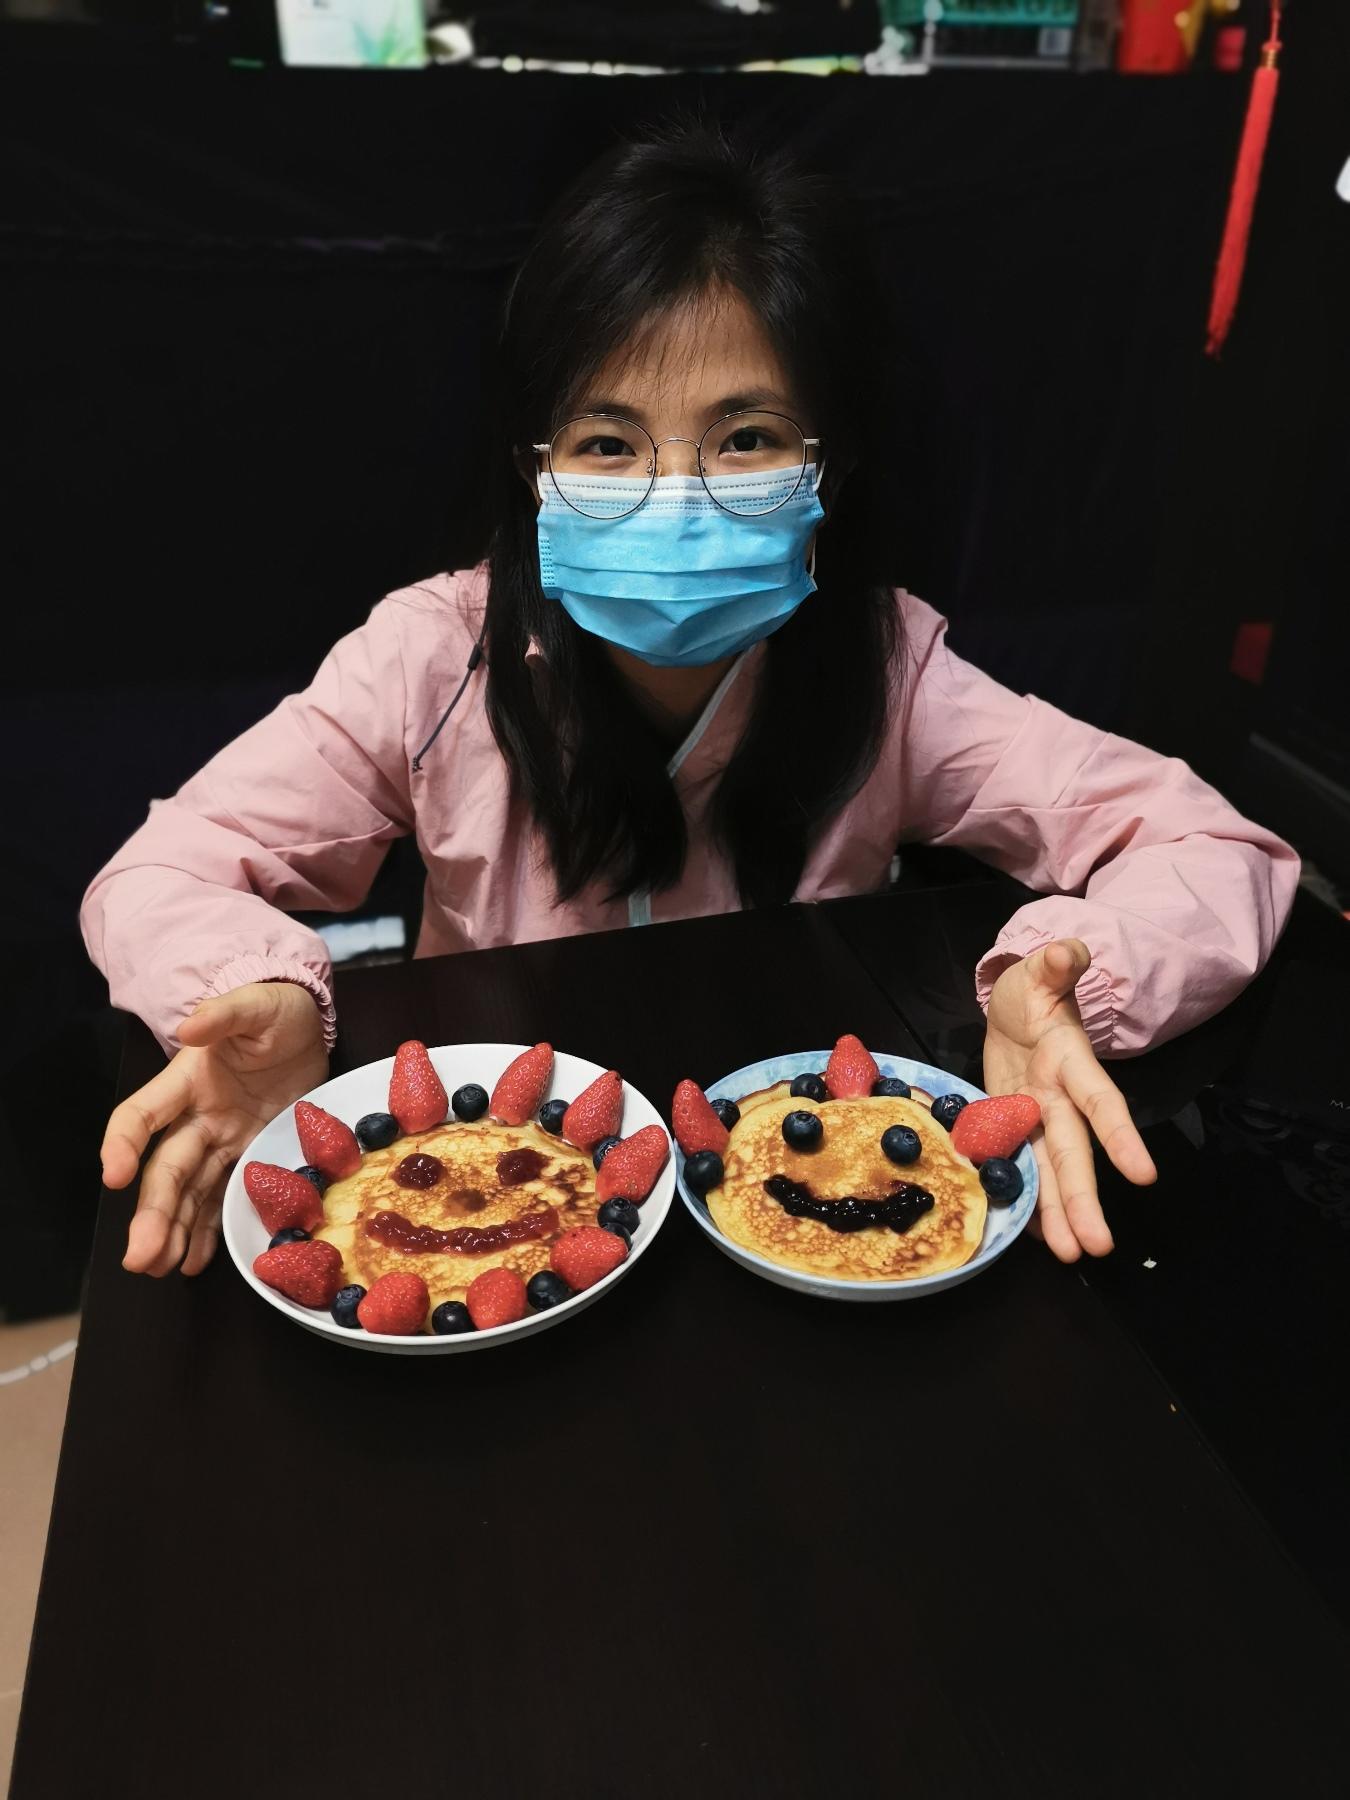 https://npc.edu.hk/sites/default/files/li_si_ying_1.jpg